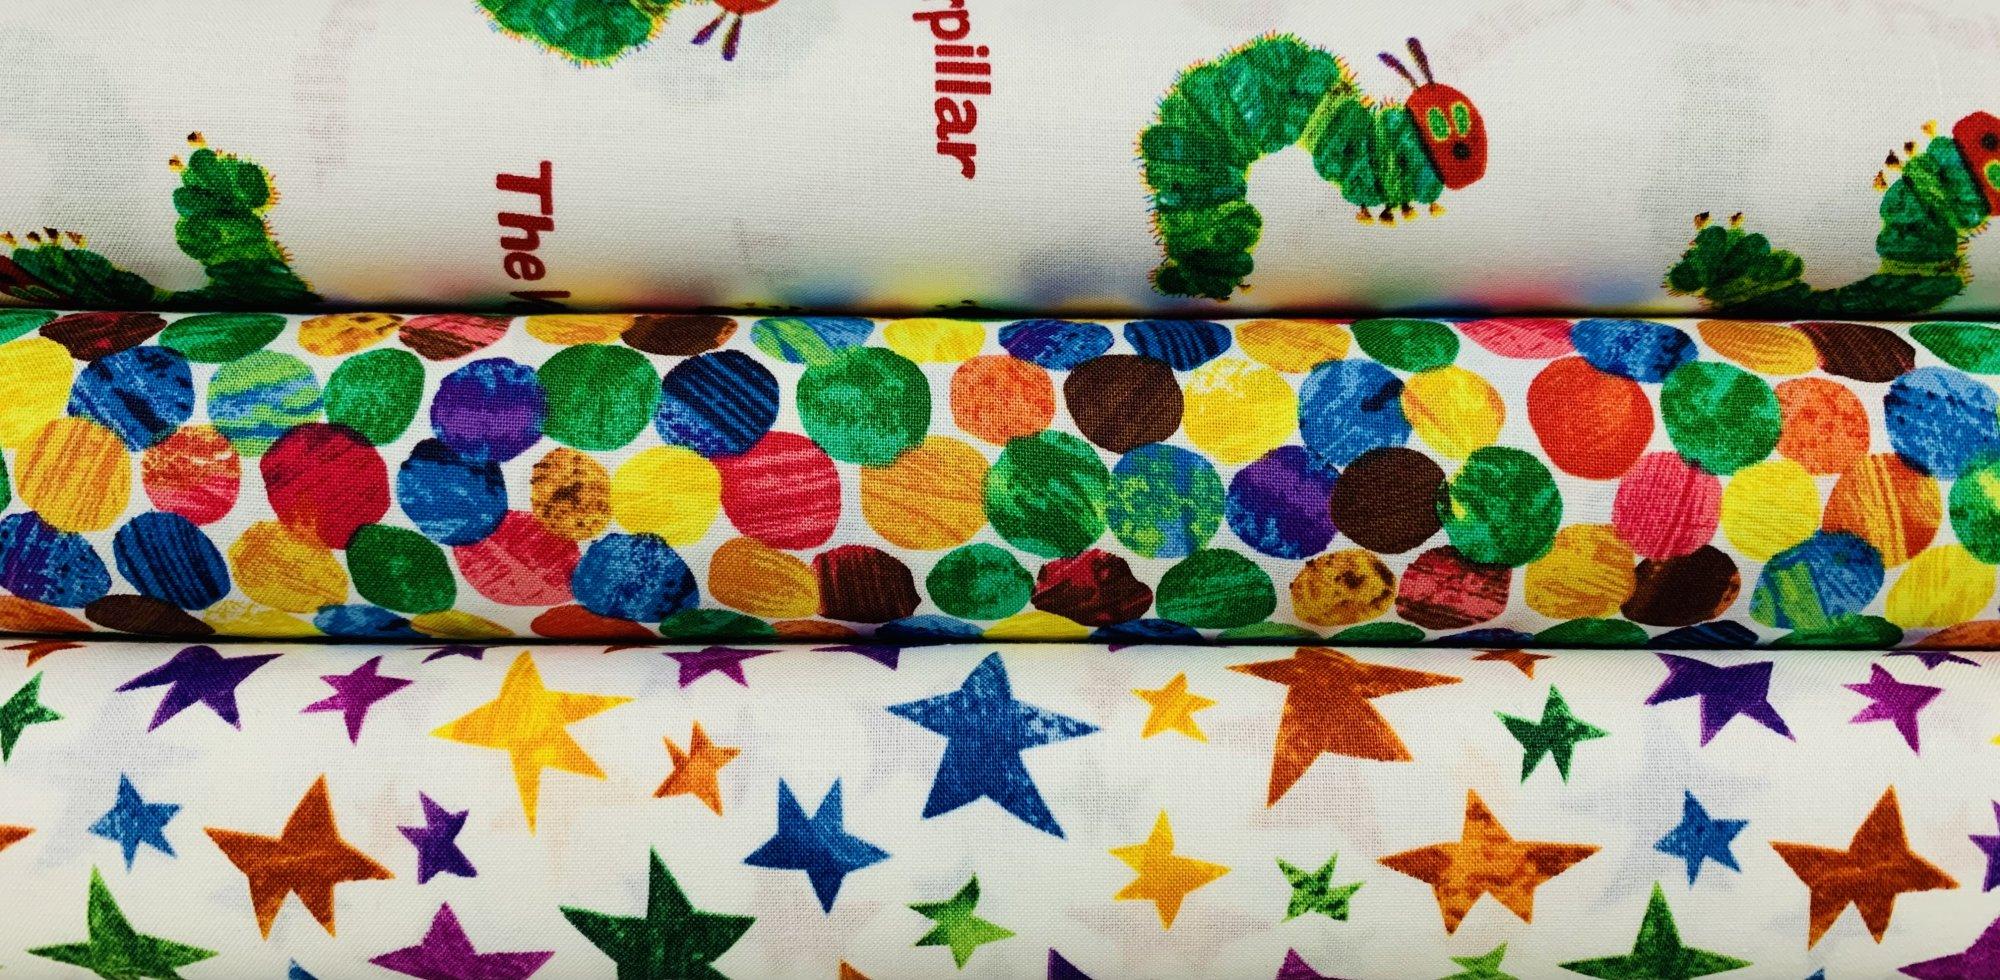 The Very Hungry Caterpillar Classics by Andover Fabrics